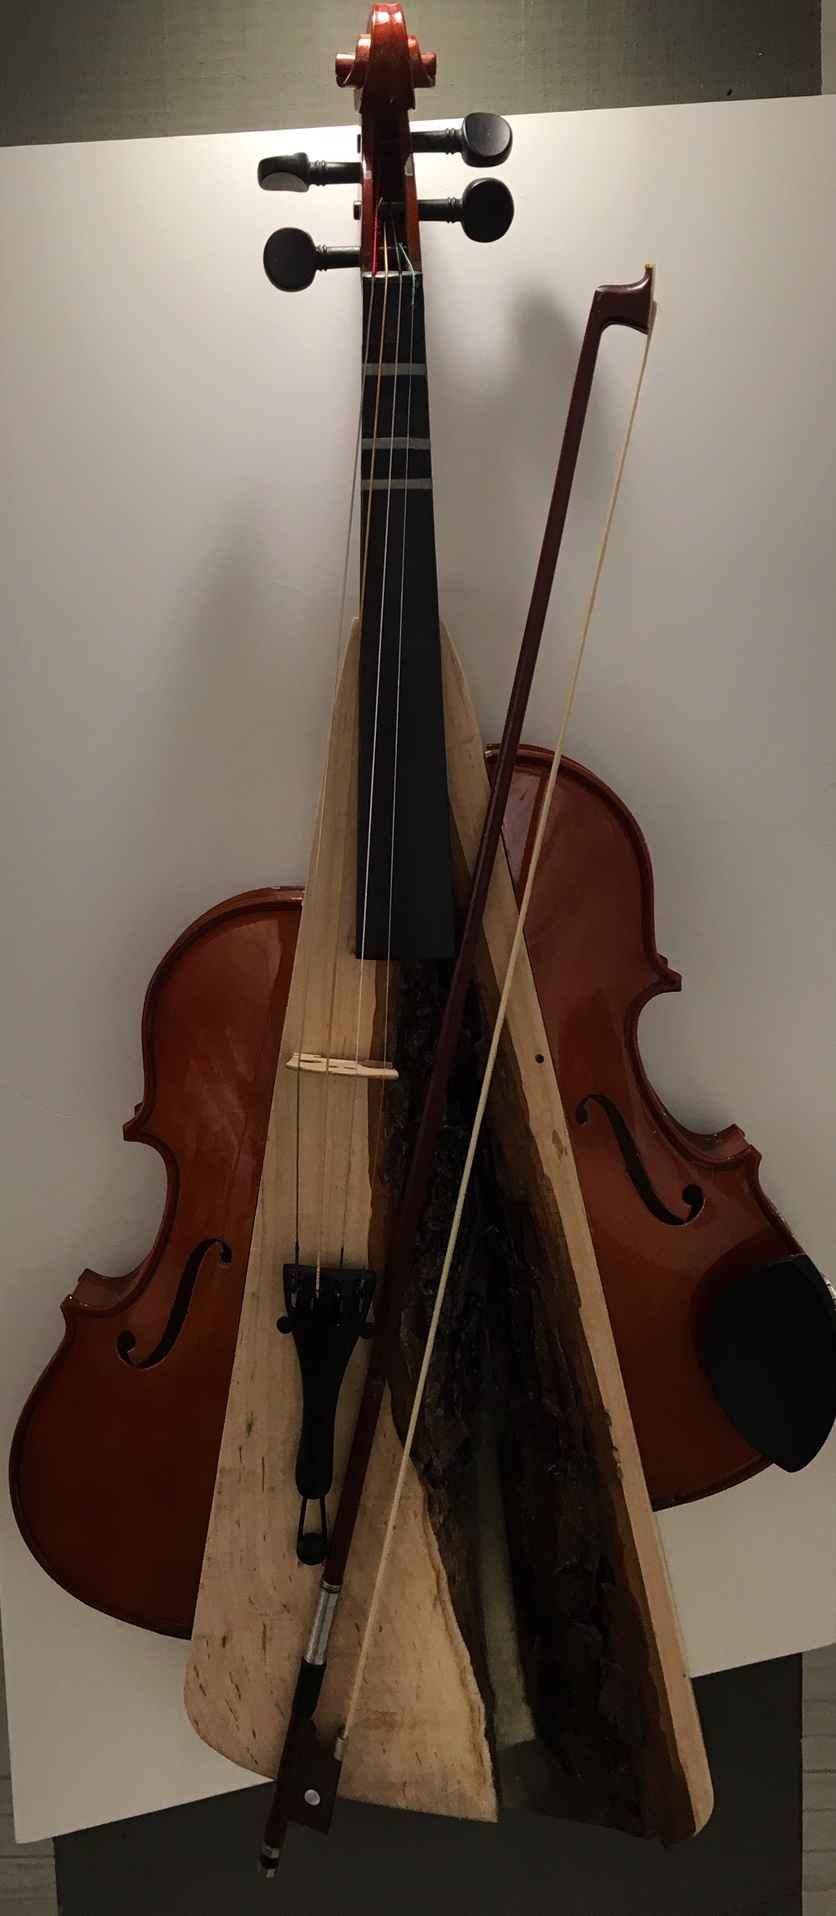 Live Edge Resin Violin by  Hans Veenvliet - Masterpiece Online